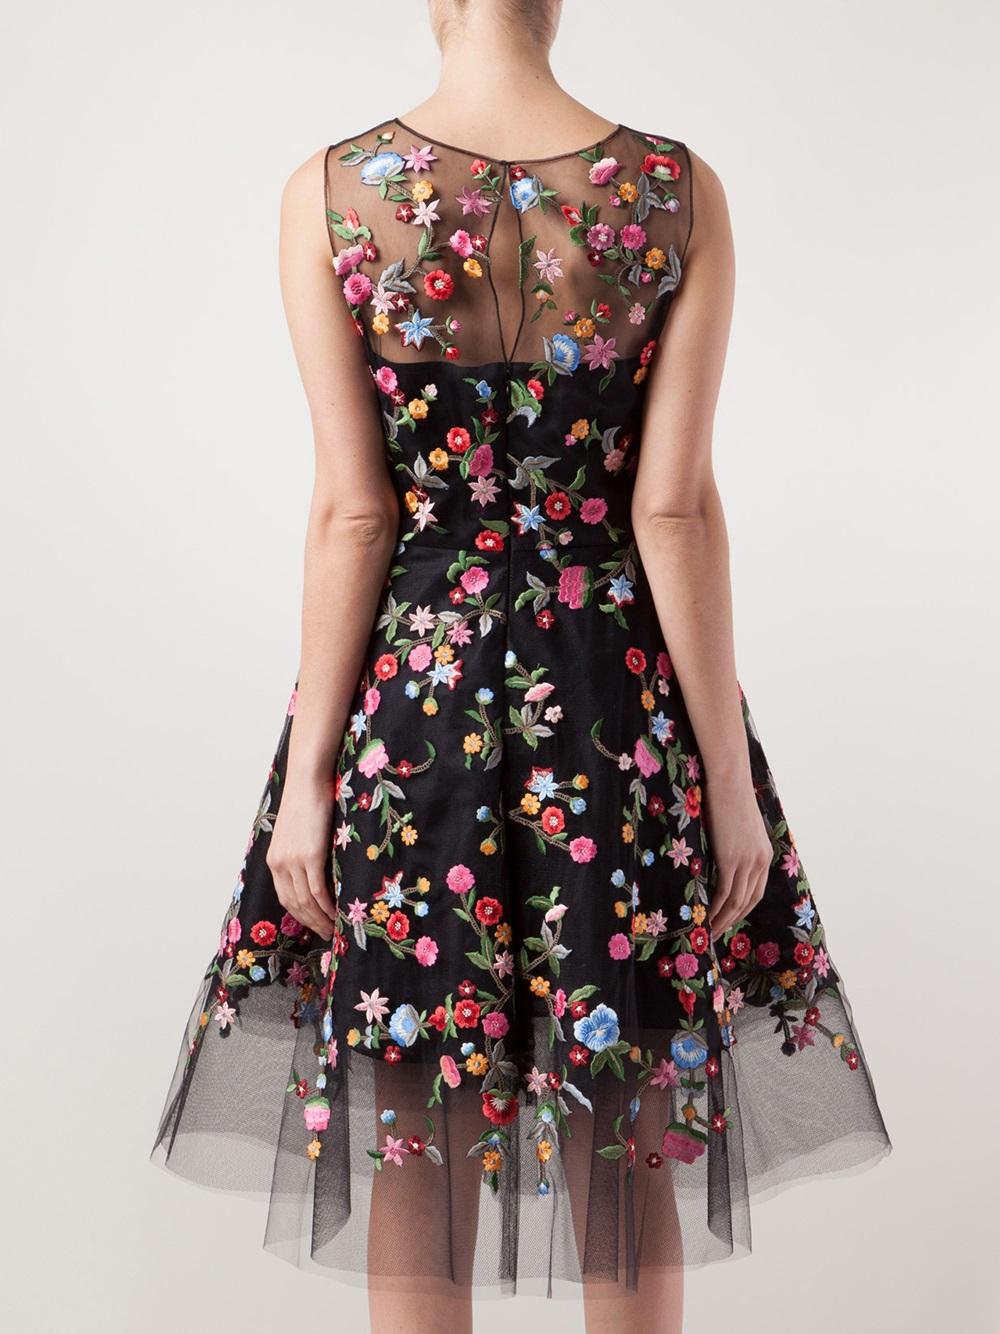 8d9a3fe54a07a Lyst - Oscar de la Renta Floral Embroidered Tulle Dress in Black